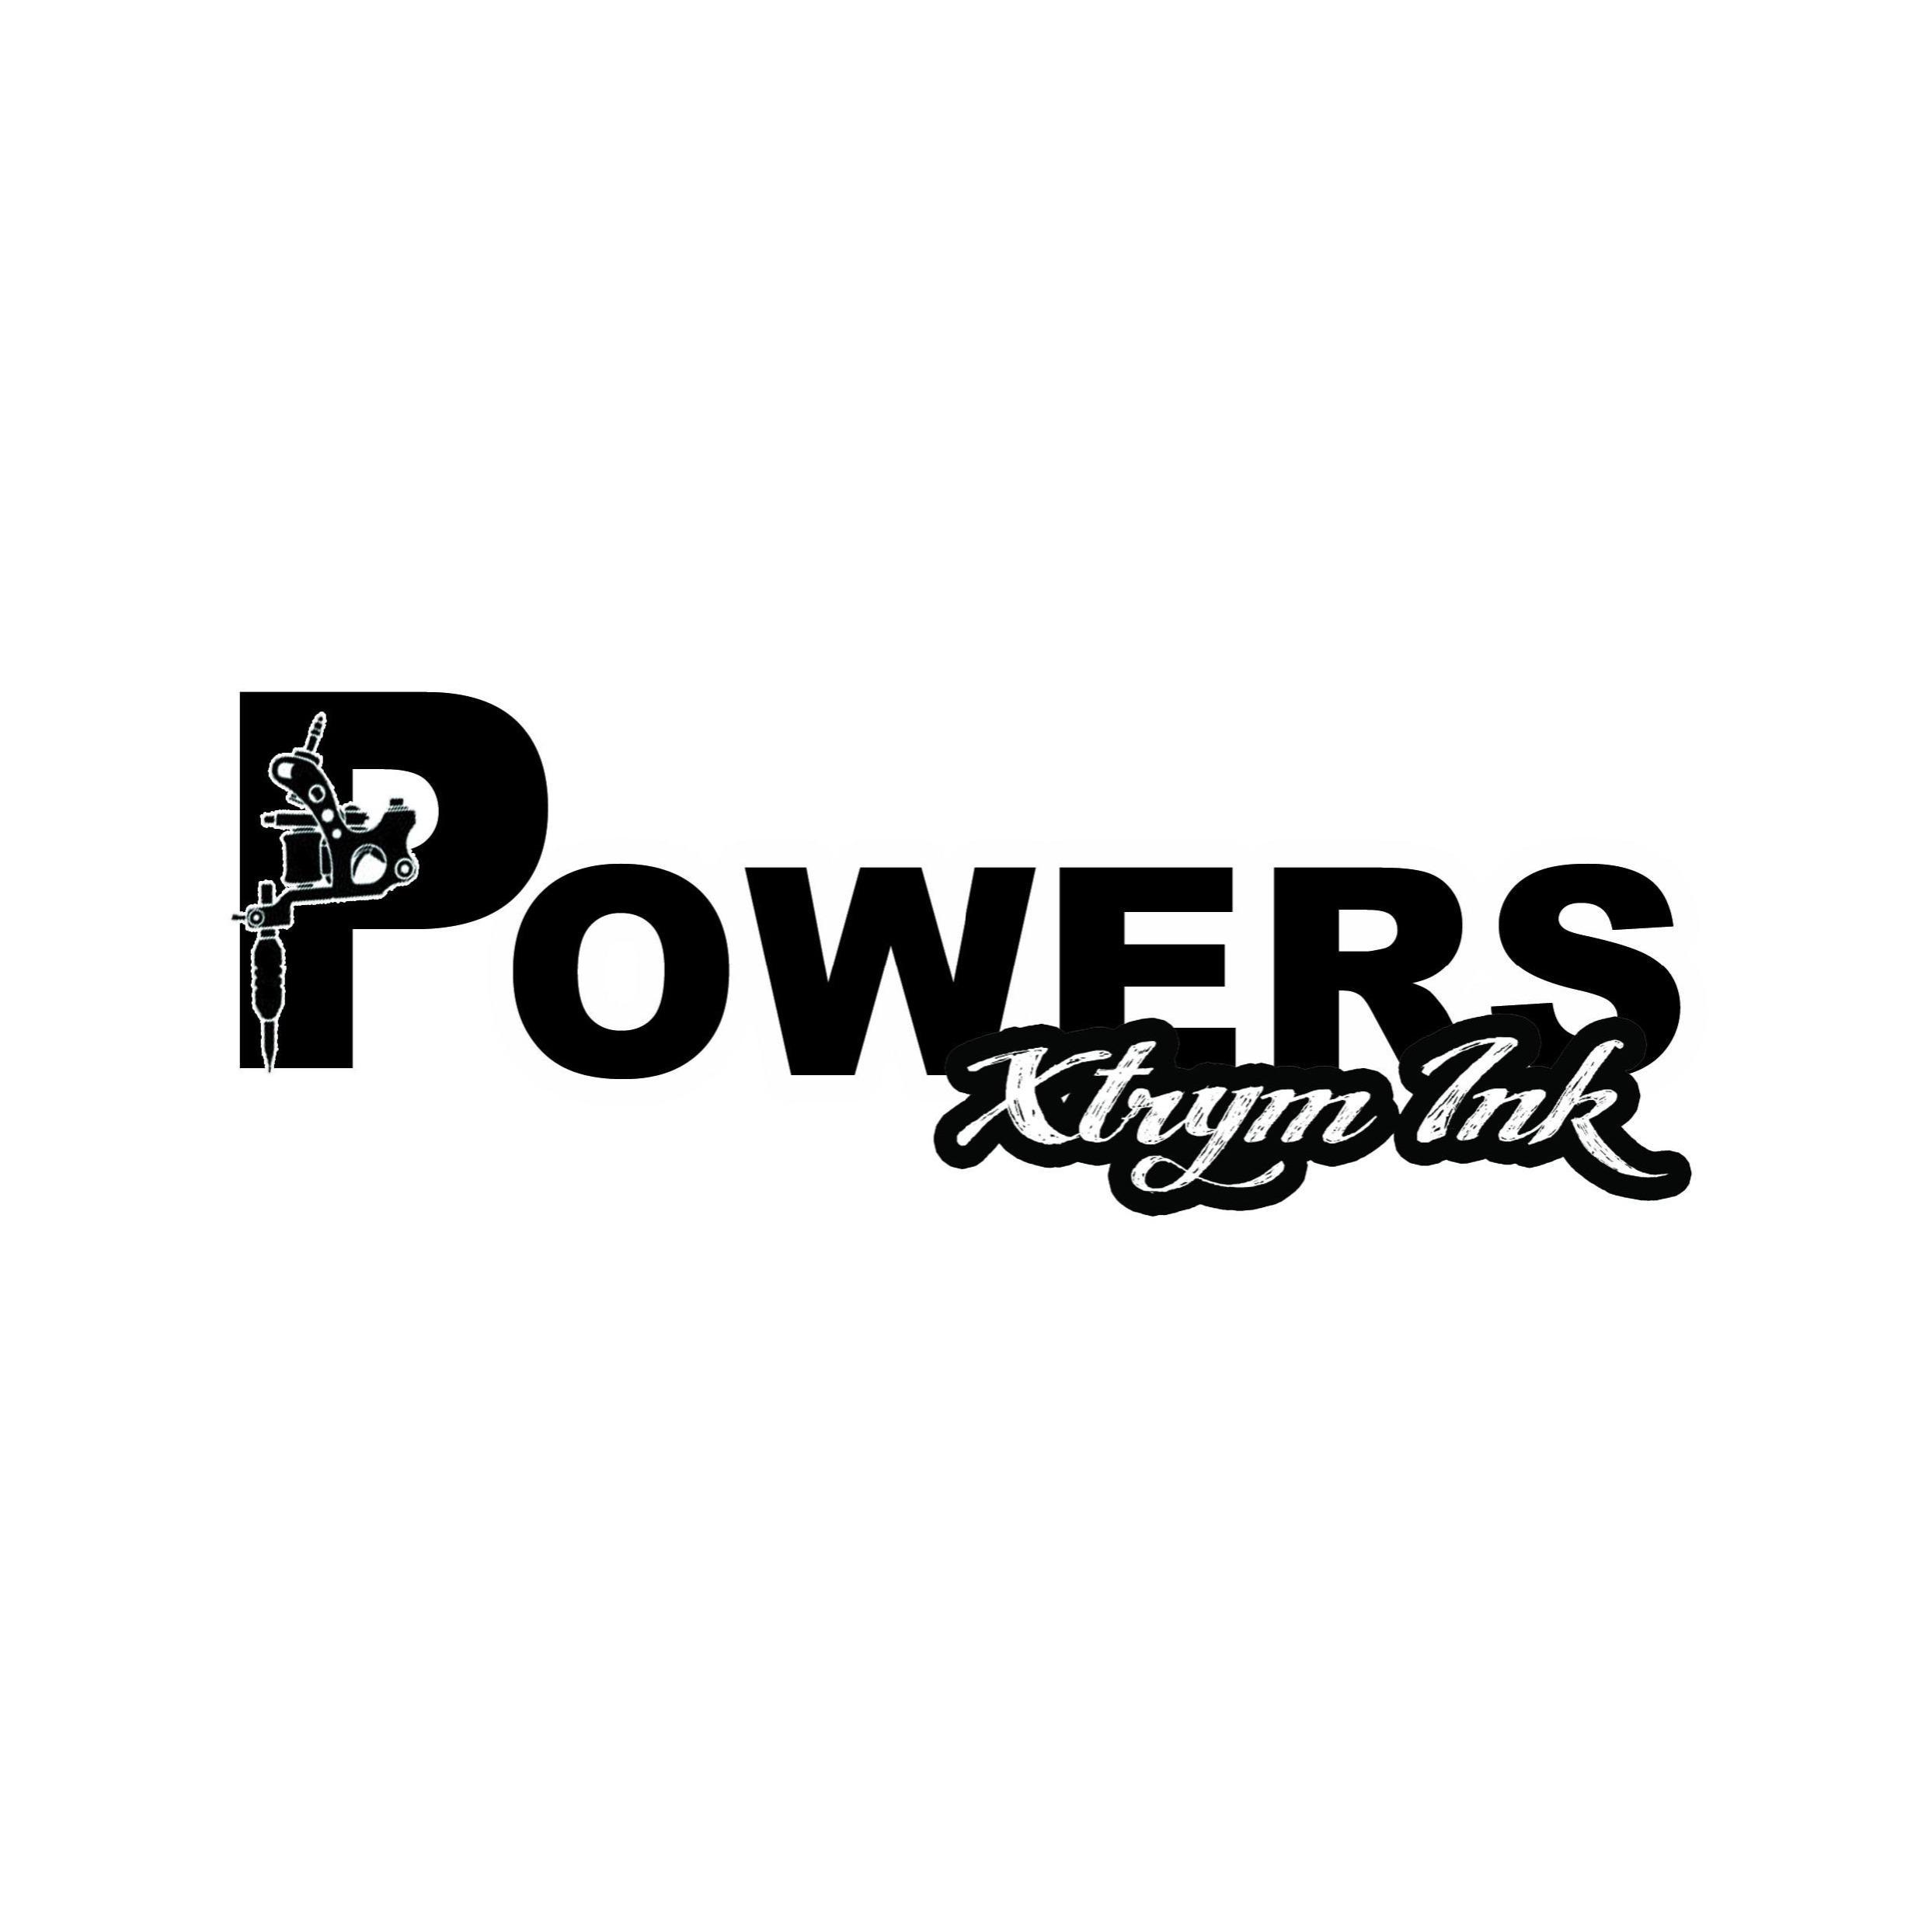 Powers Xtrym Ink Tattoos and Piercings Studio